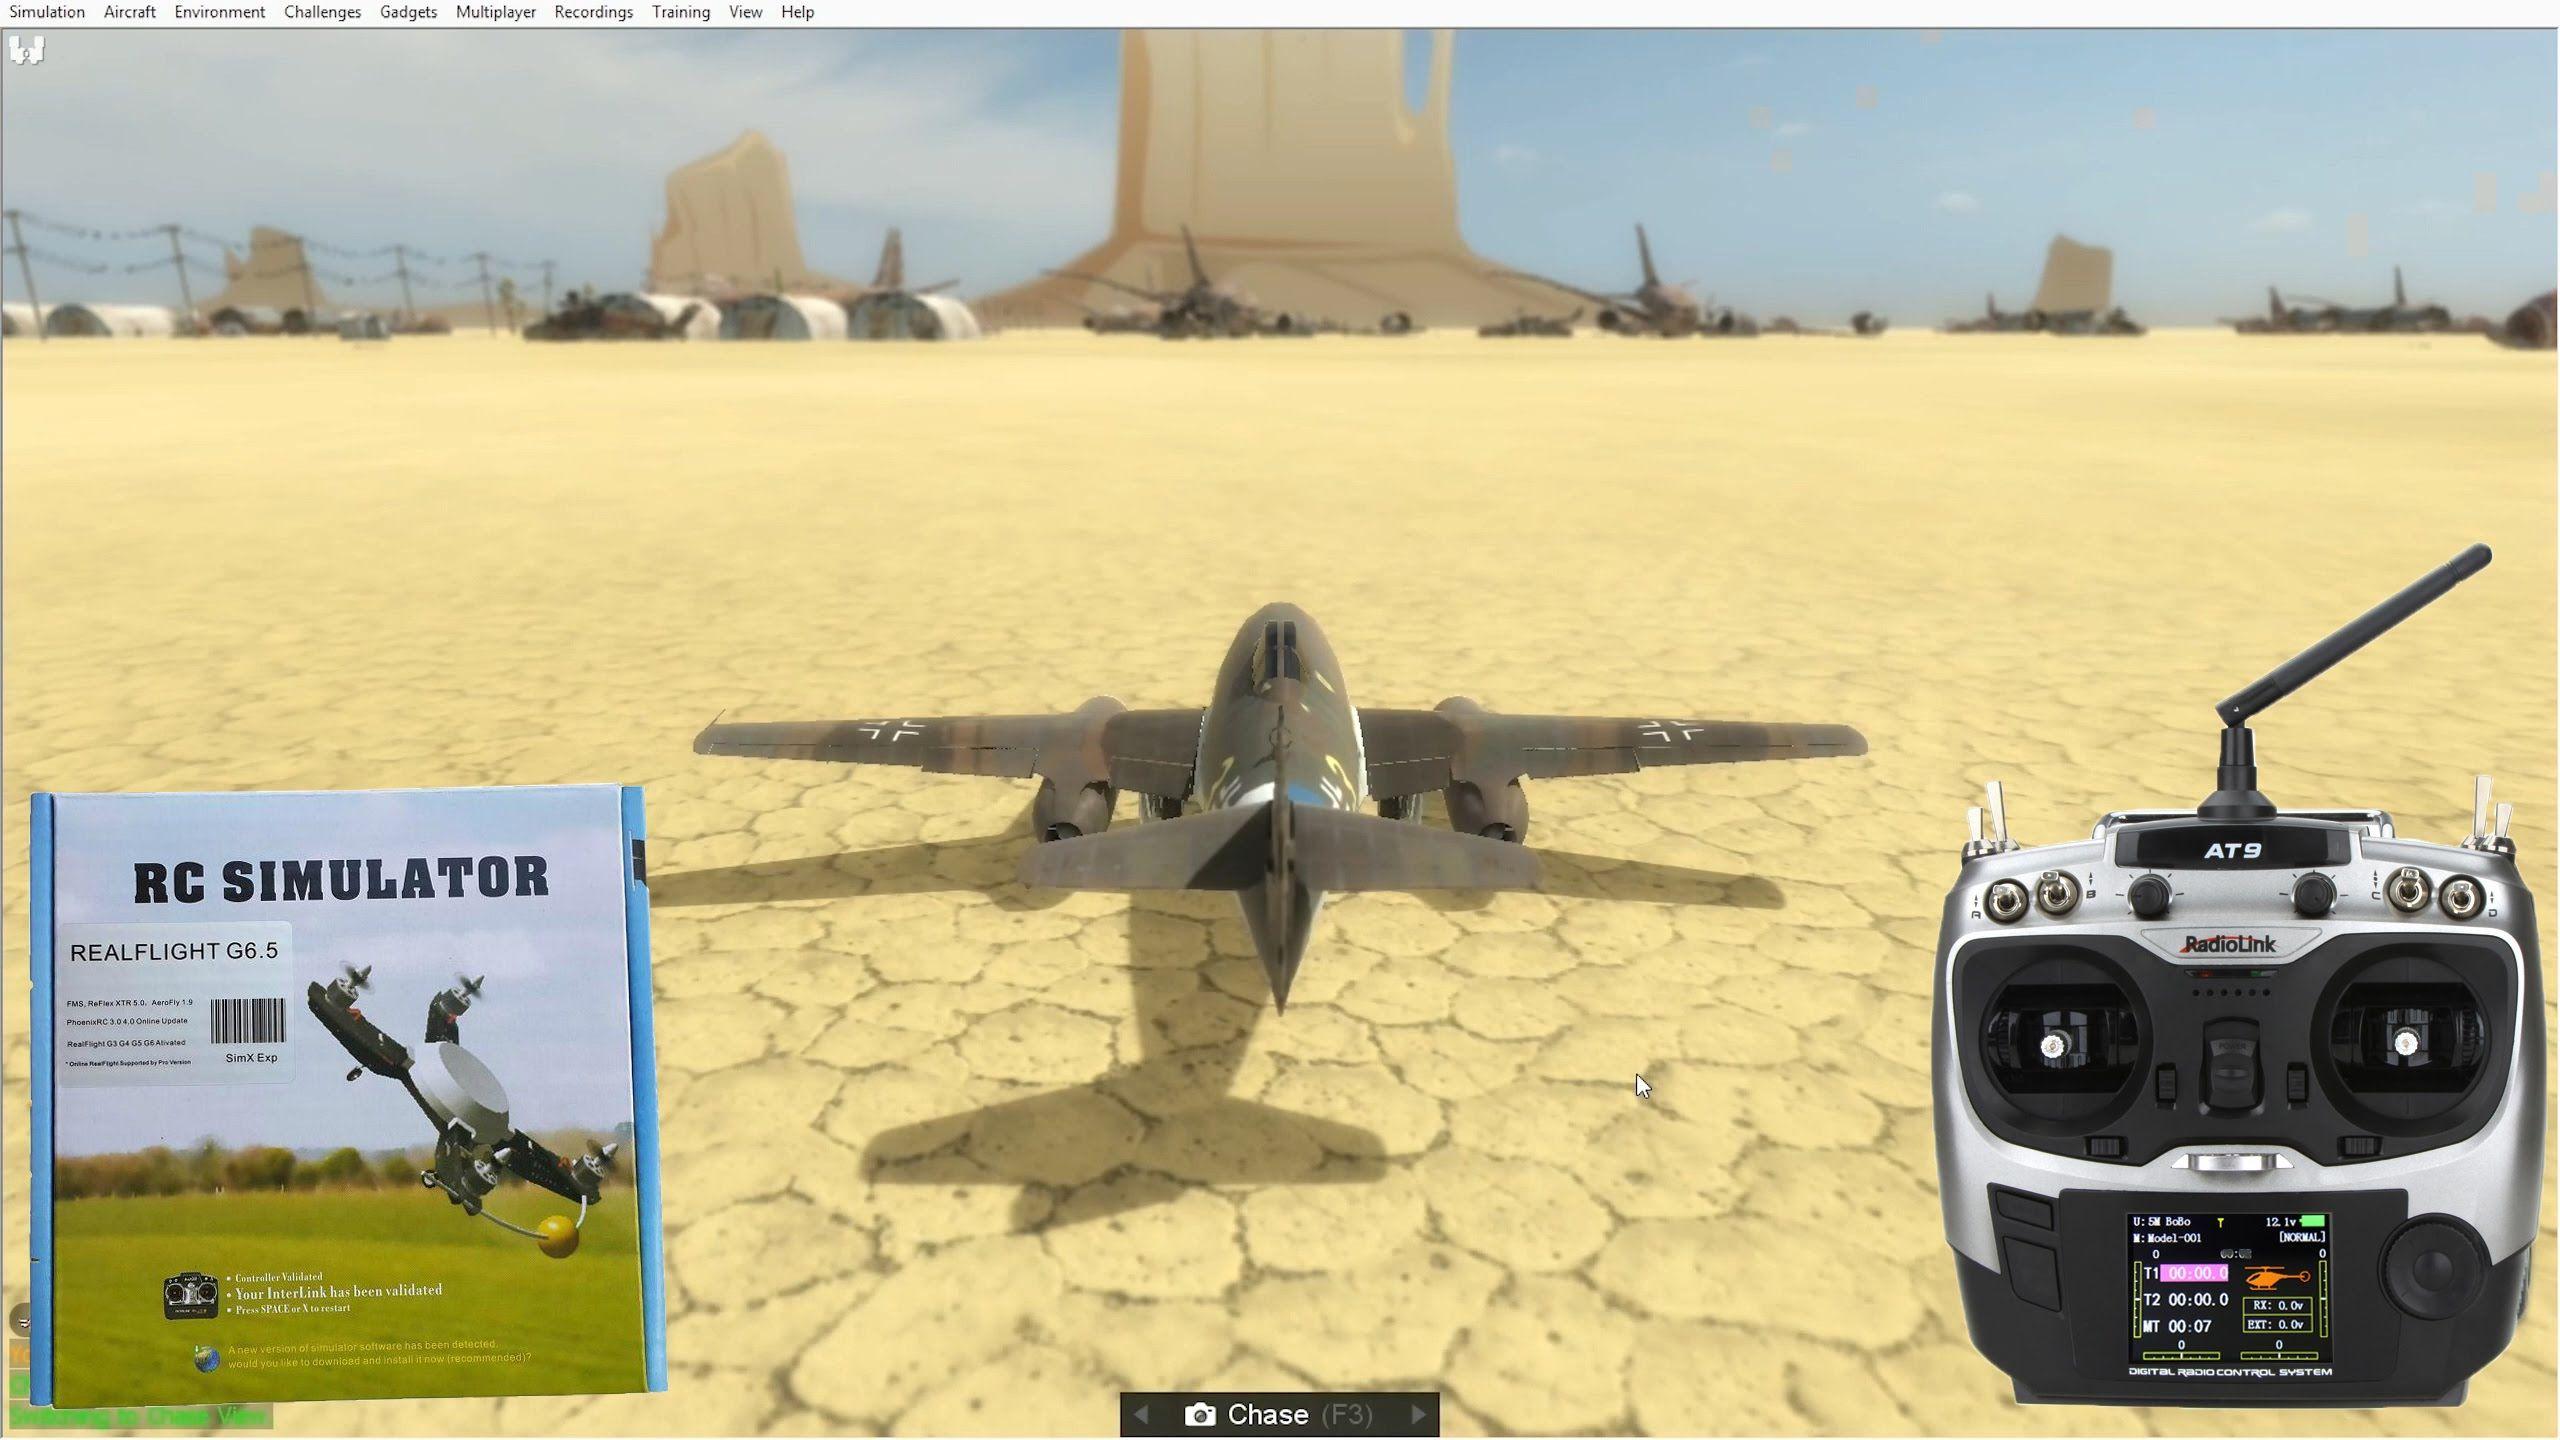 RC Simulator (PhoenixRC, RealFlight) + Radiolink AT9